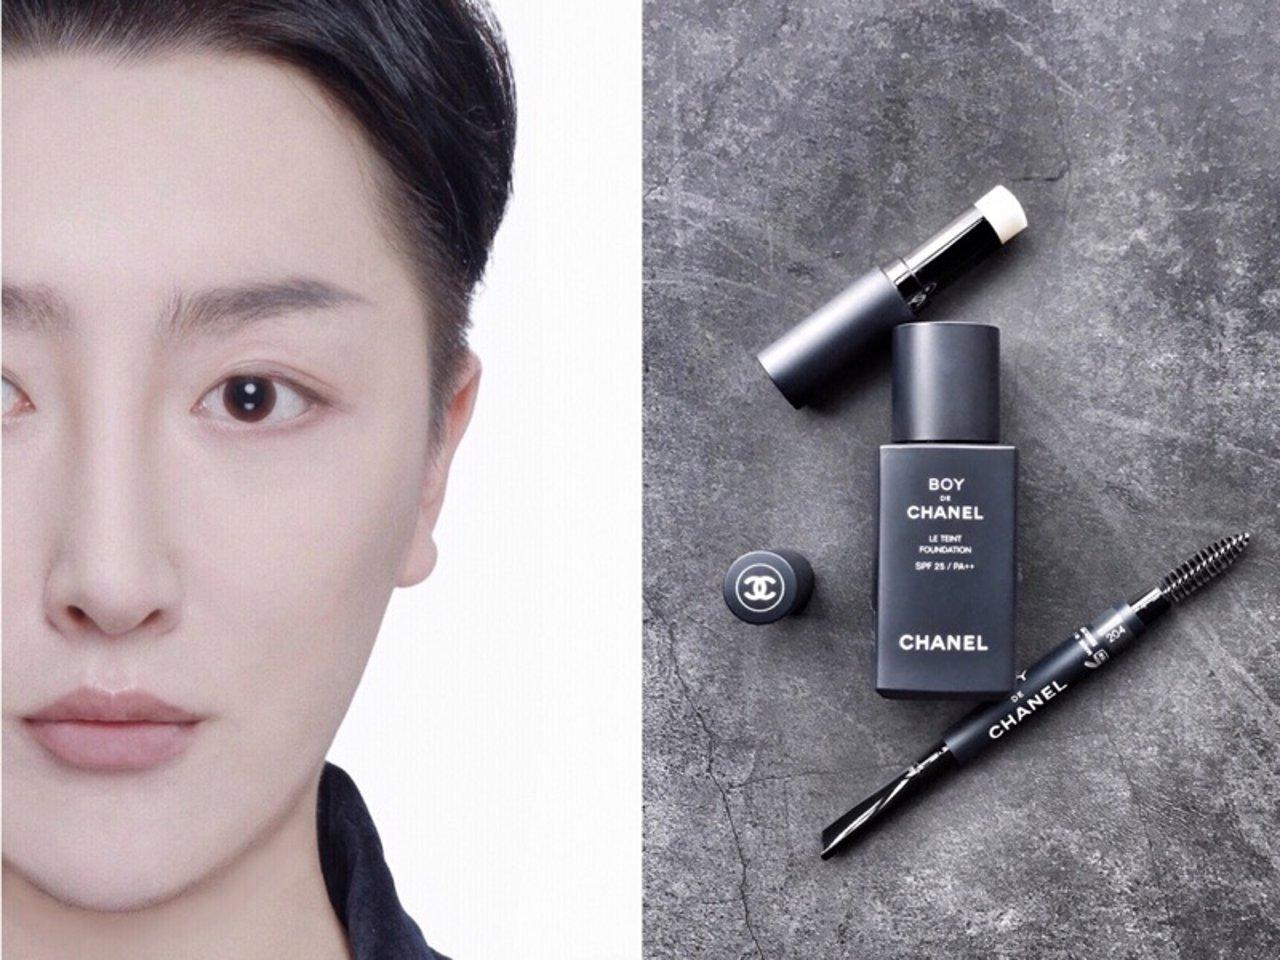 Boy de Chanel|香奈儿首个男士化妆品系列